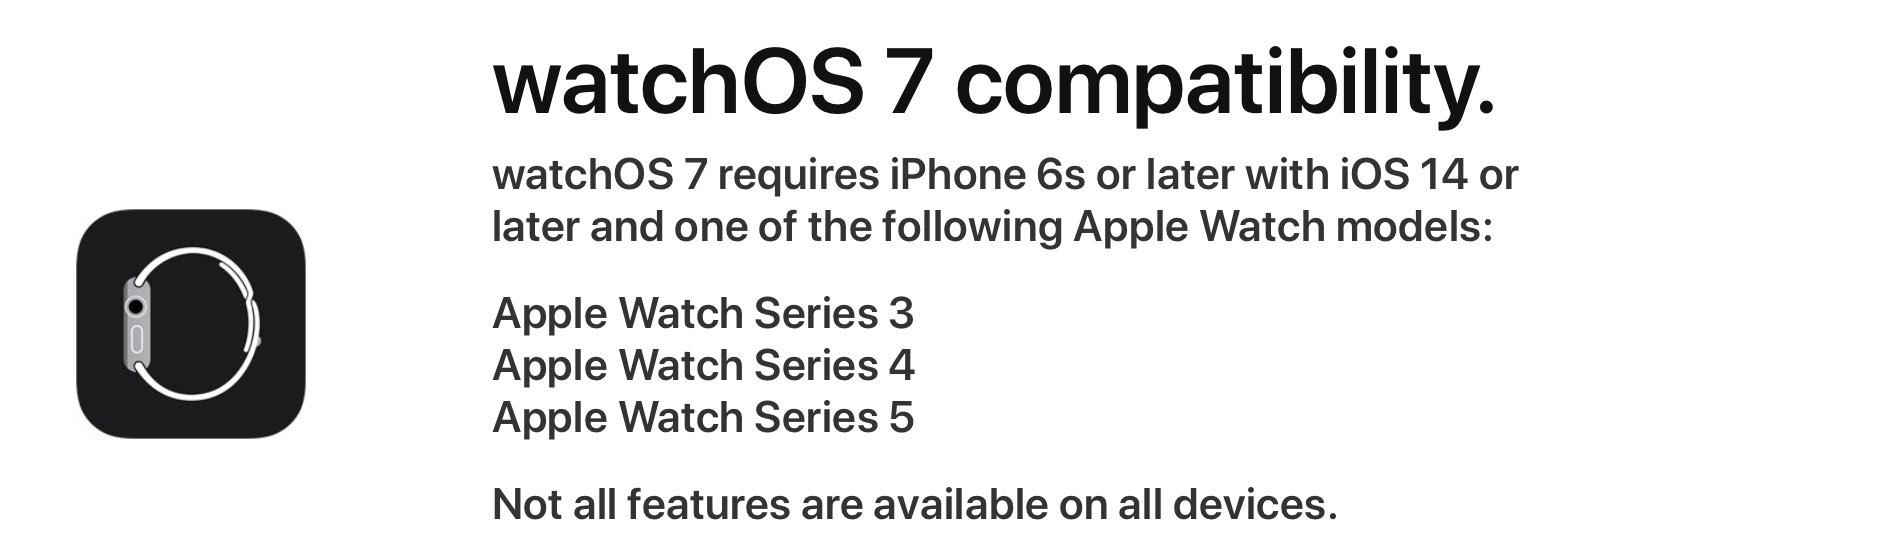 WatchOS 7 Compatibility